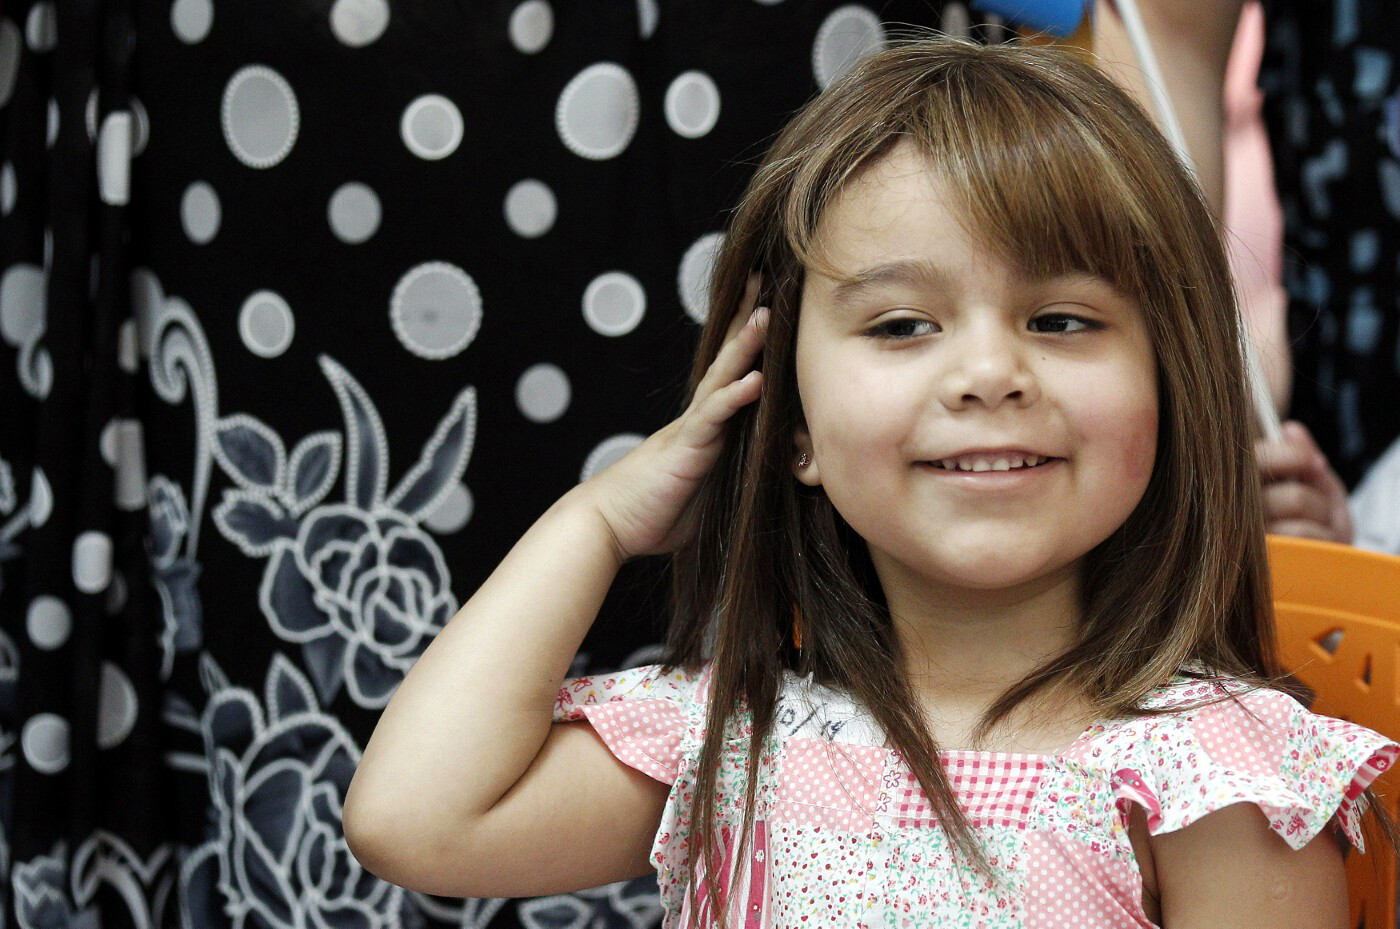 The Hair Stylist Helping Children Fighting Cancer Regain